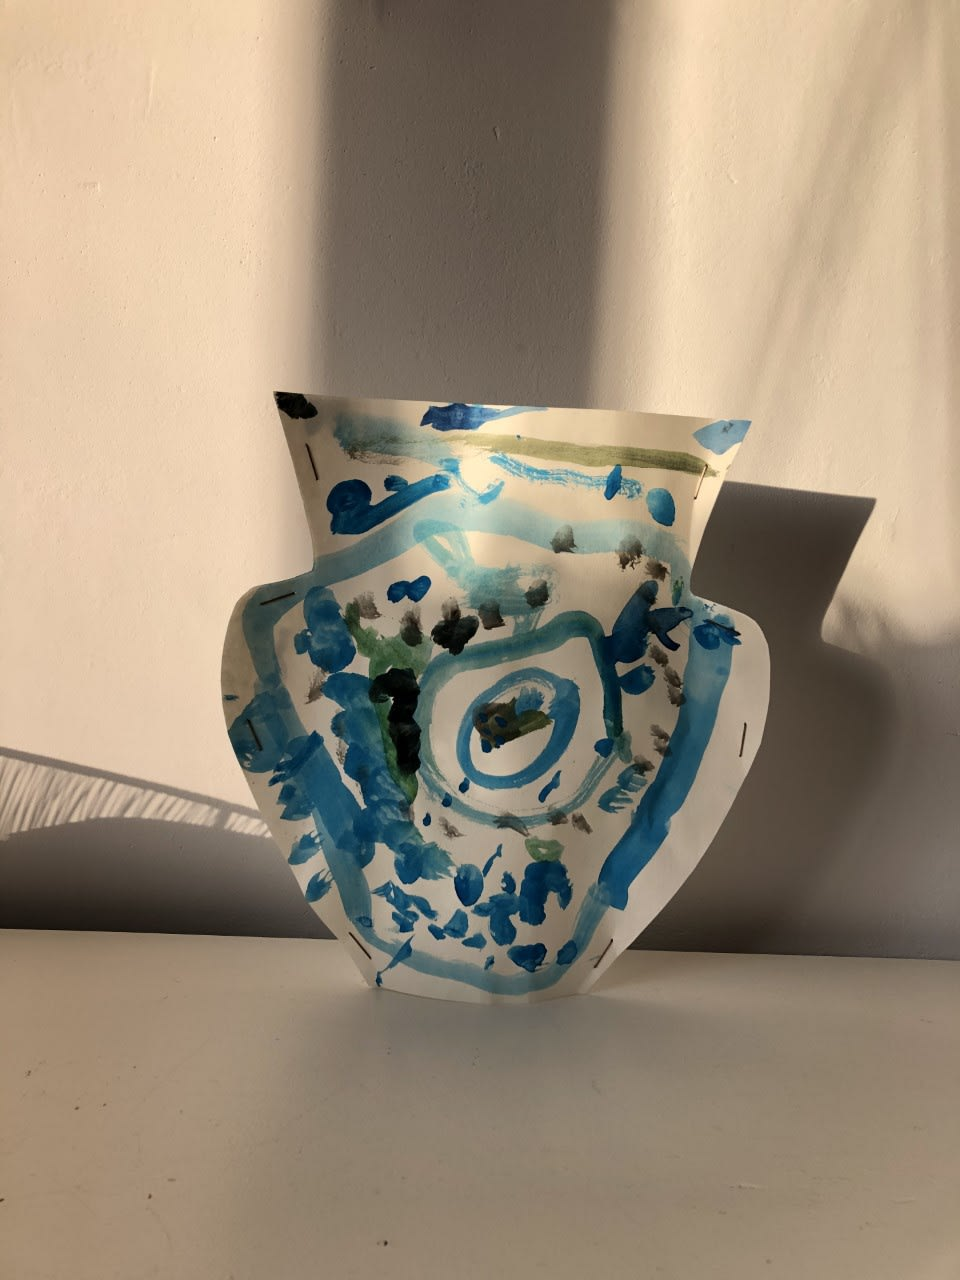 Joseph Goodridge, age 3 Matisse inspired cardboard Ming Vase